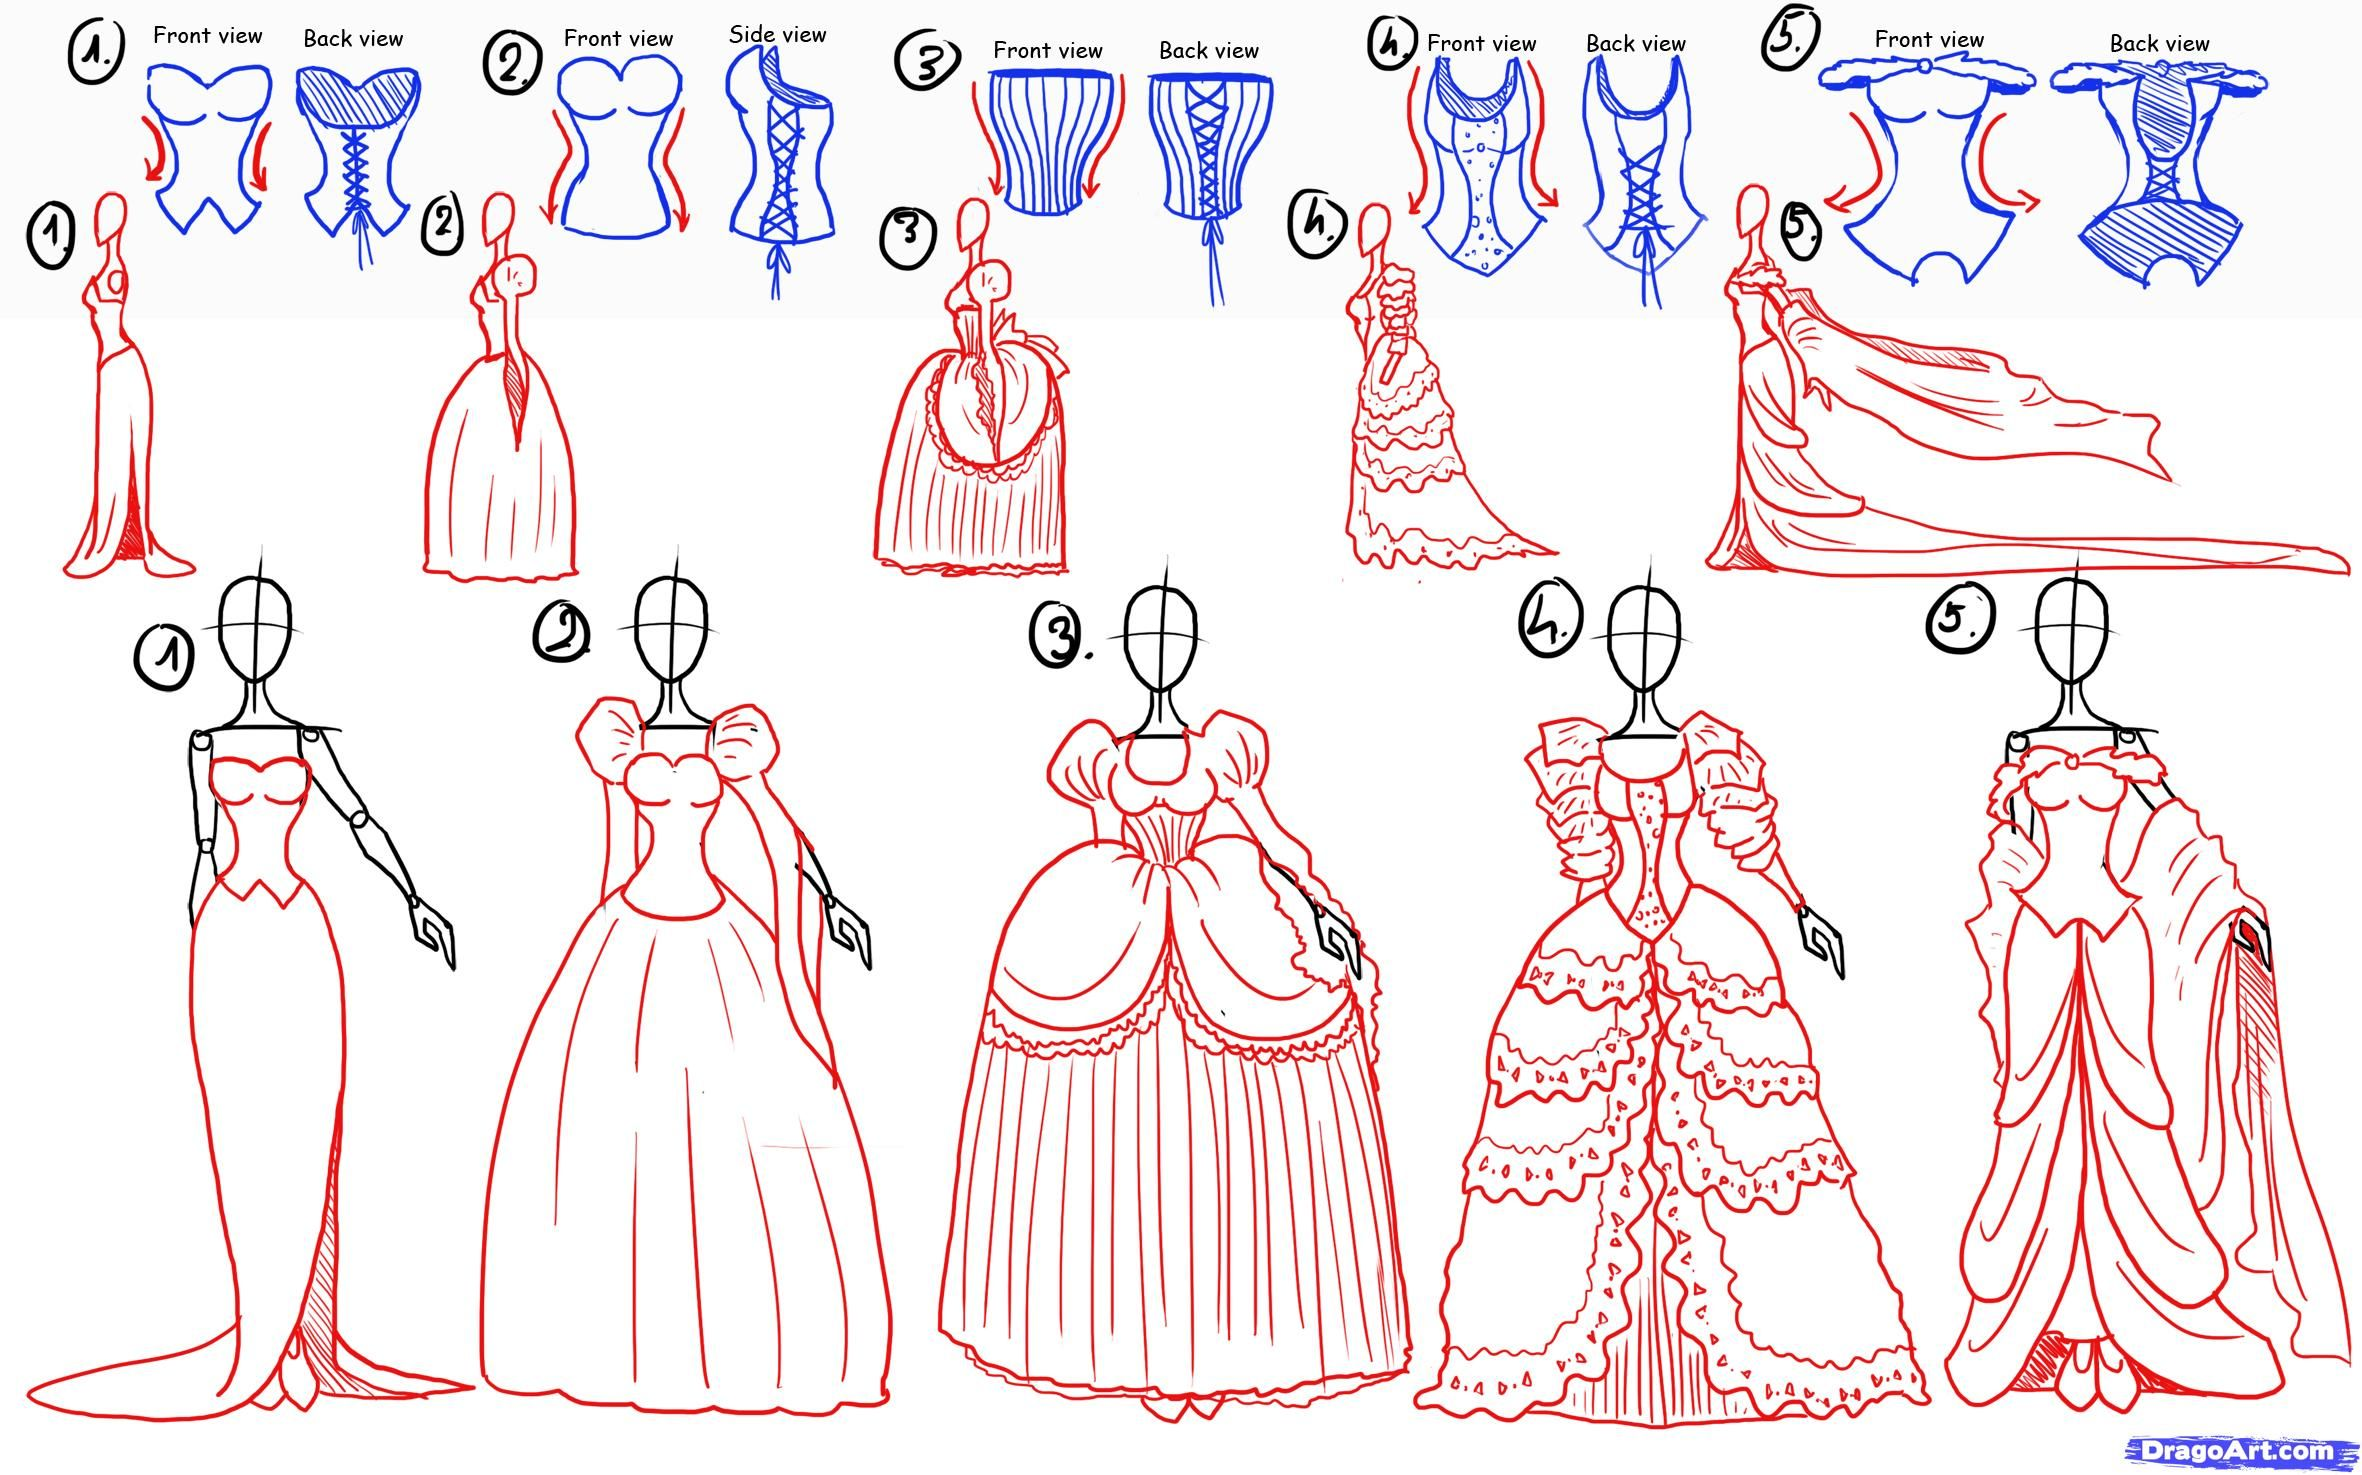 How To Draw Princesses Step 5 1 000000057325 5 Jpg 2362 How To Draw A Princess Dress Step By Step Printable